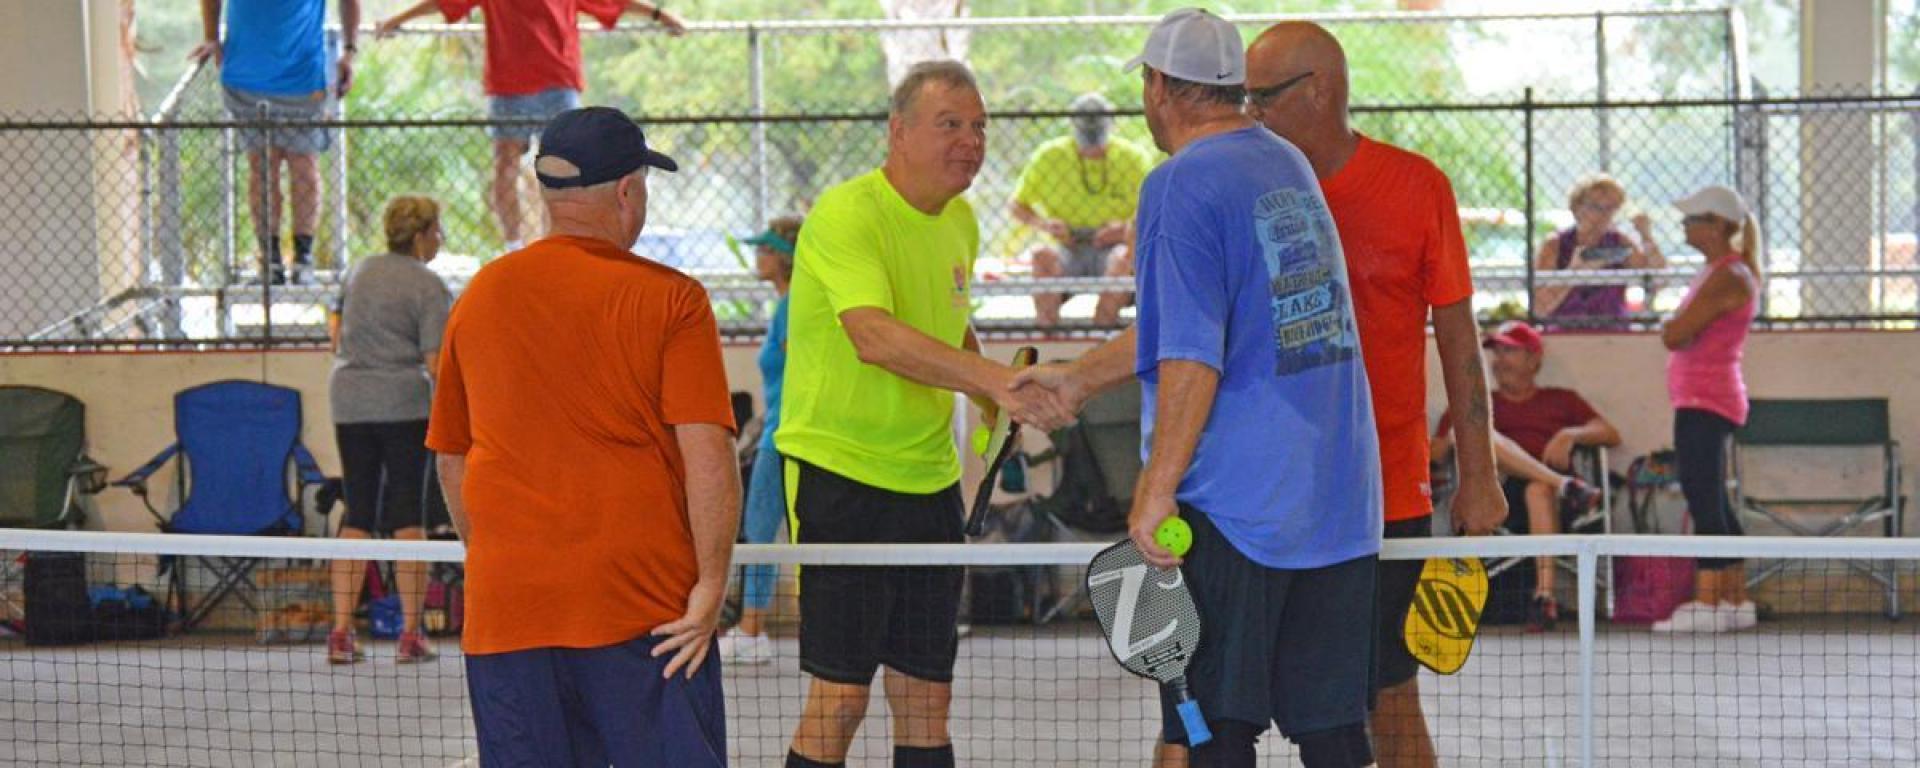 Martin County Senior Games pickleball participants.